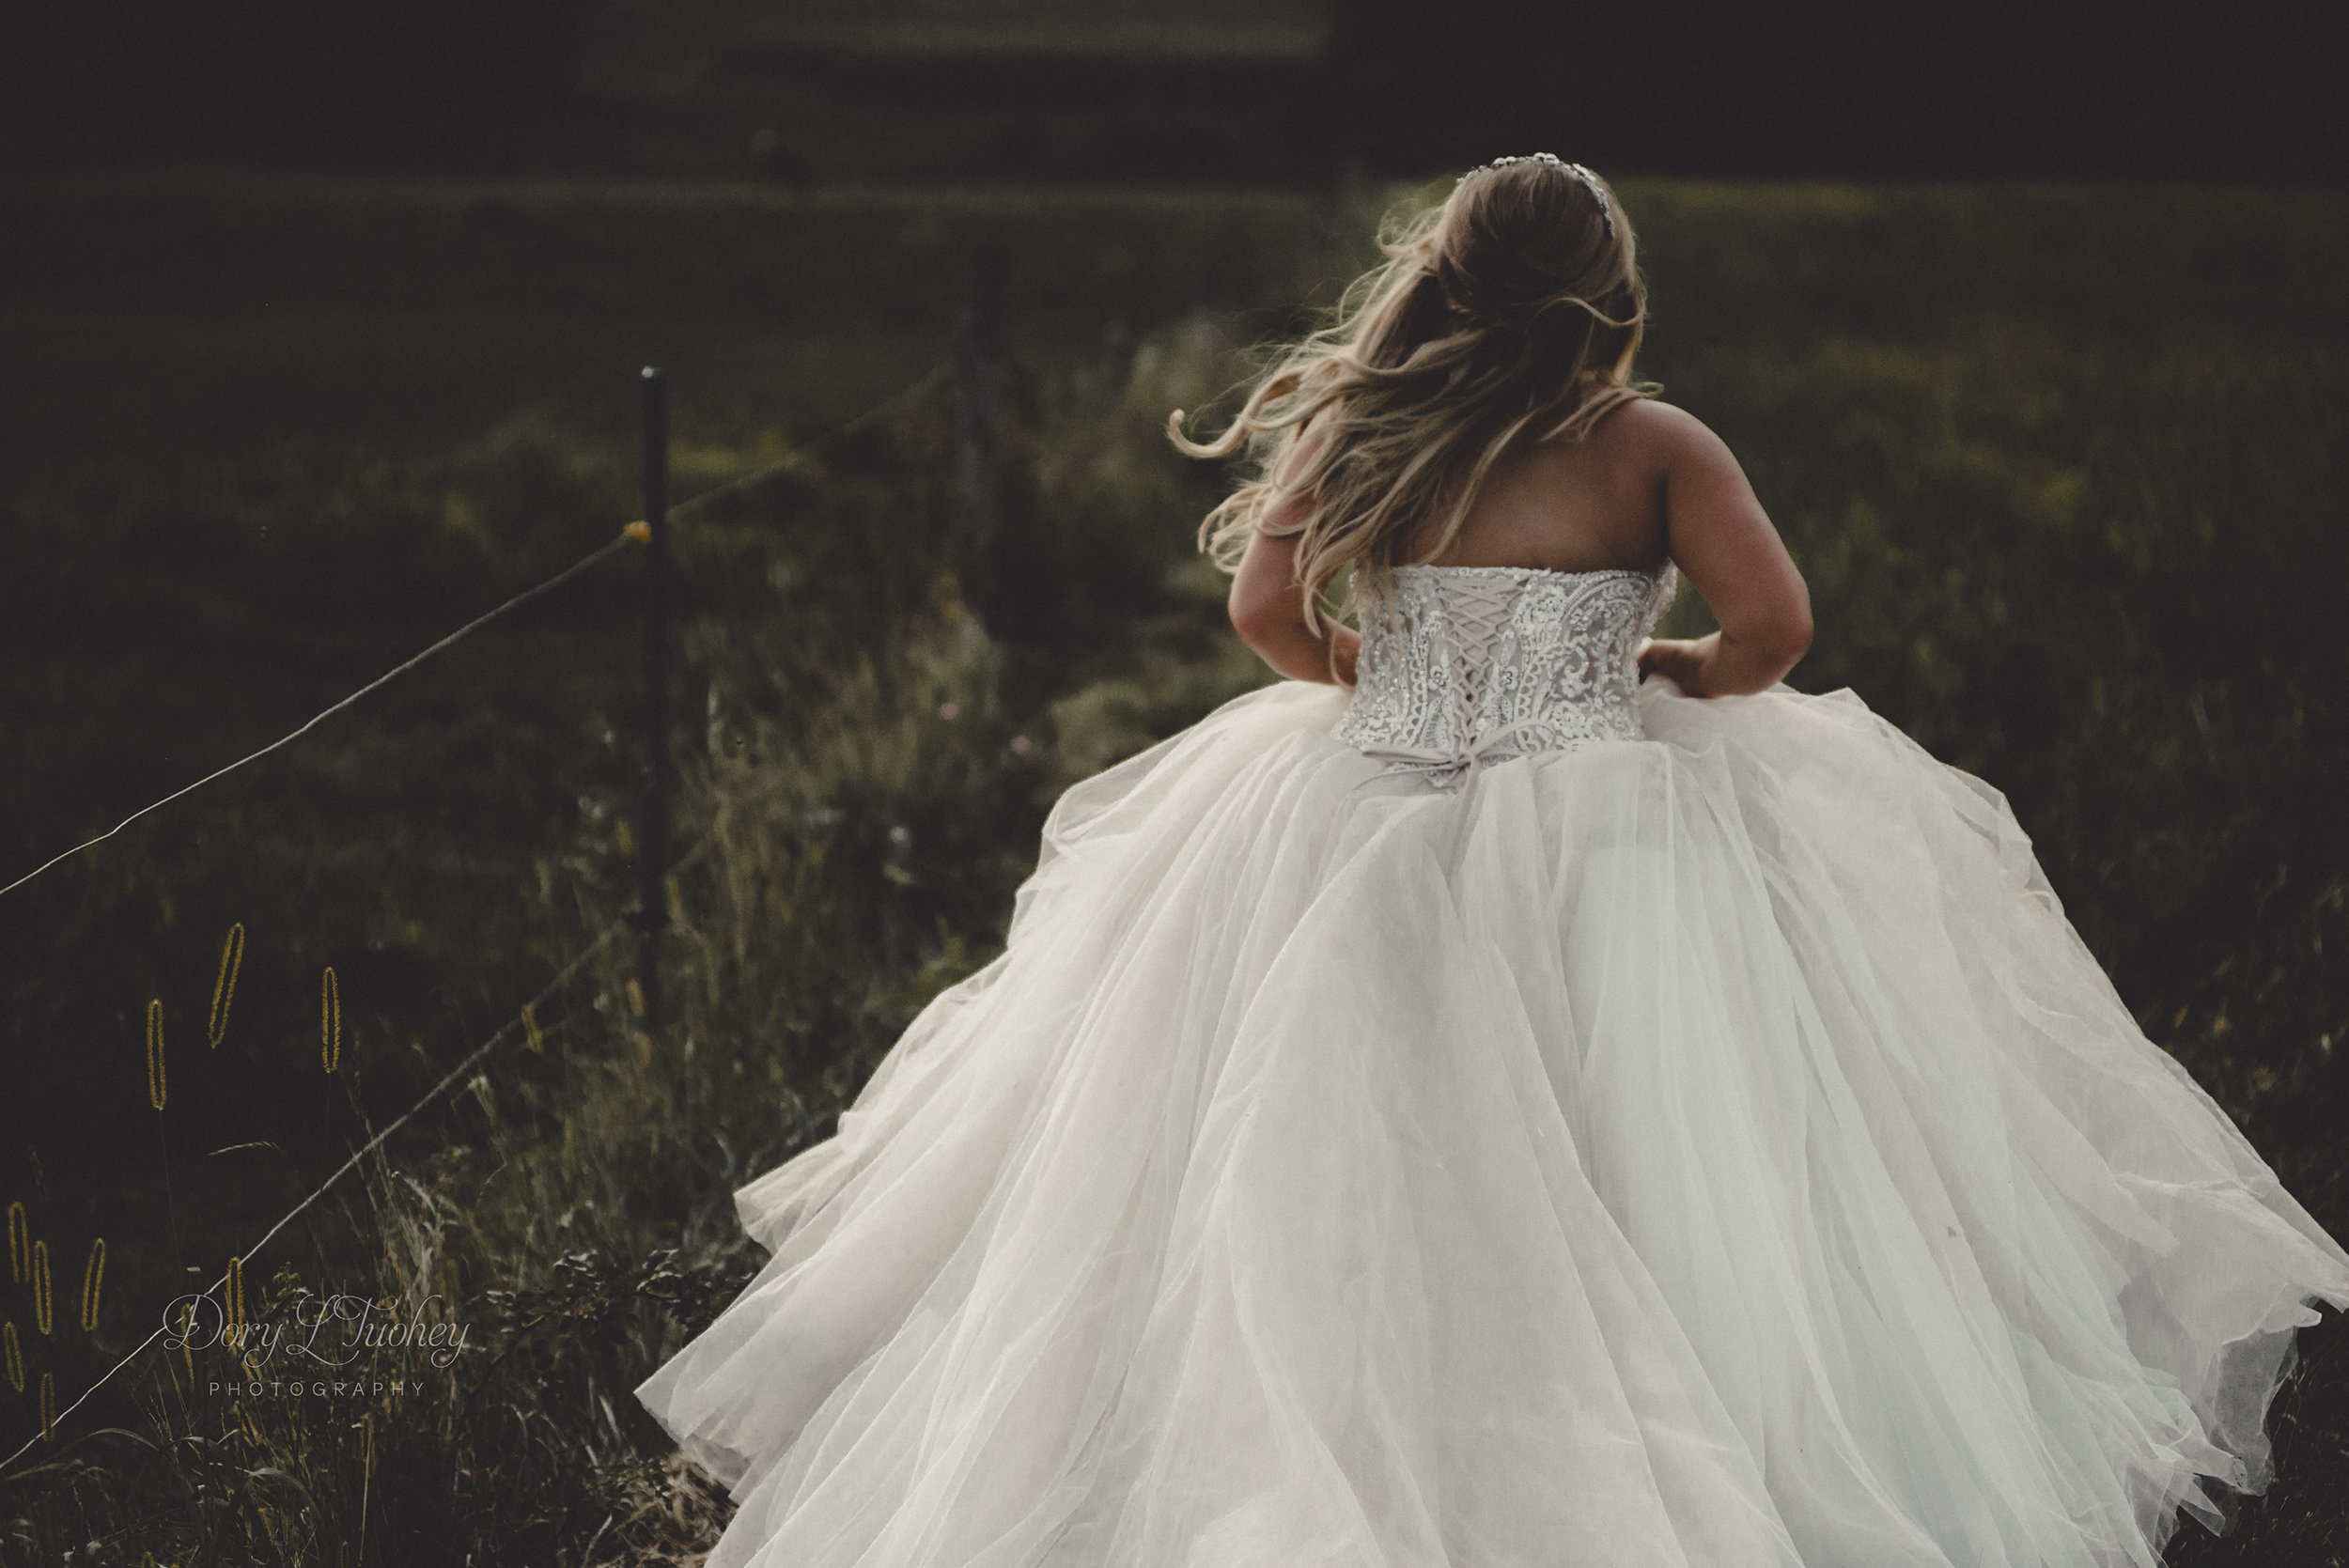 Dory_wedding_oak_hill_galena_farm_horses_field_bride_tulle_photographer_01.jpg